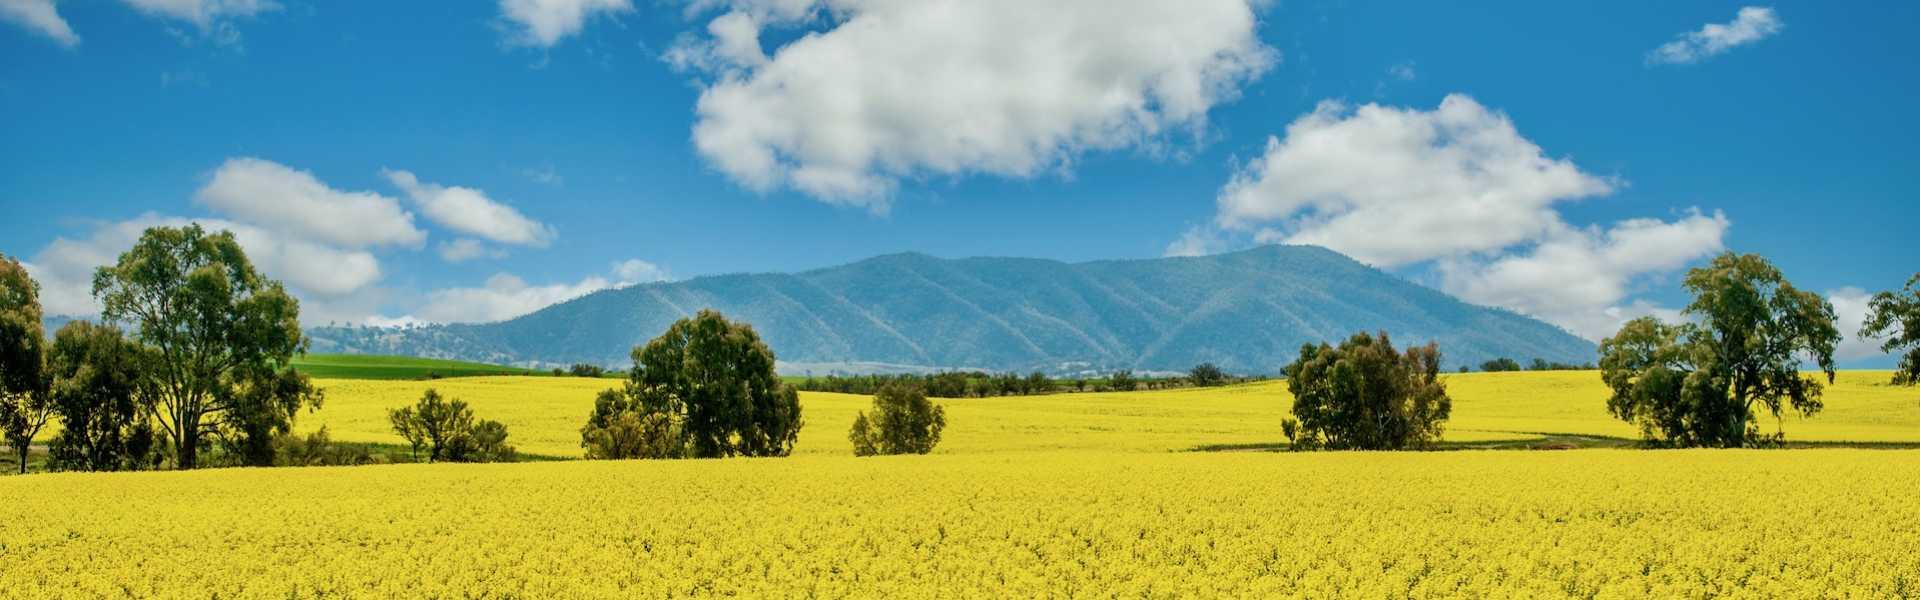 Kui Parks, Melrose Caravan & Tourist Park, Mount Remarkable